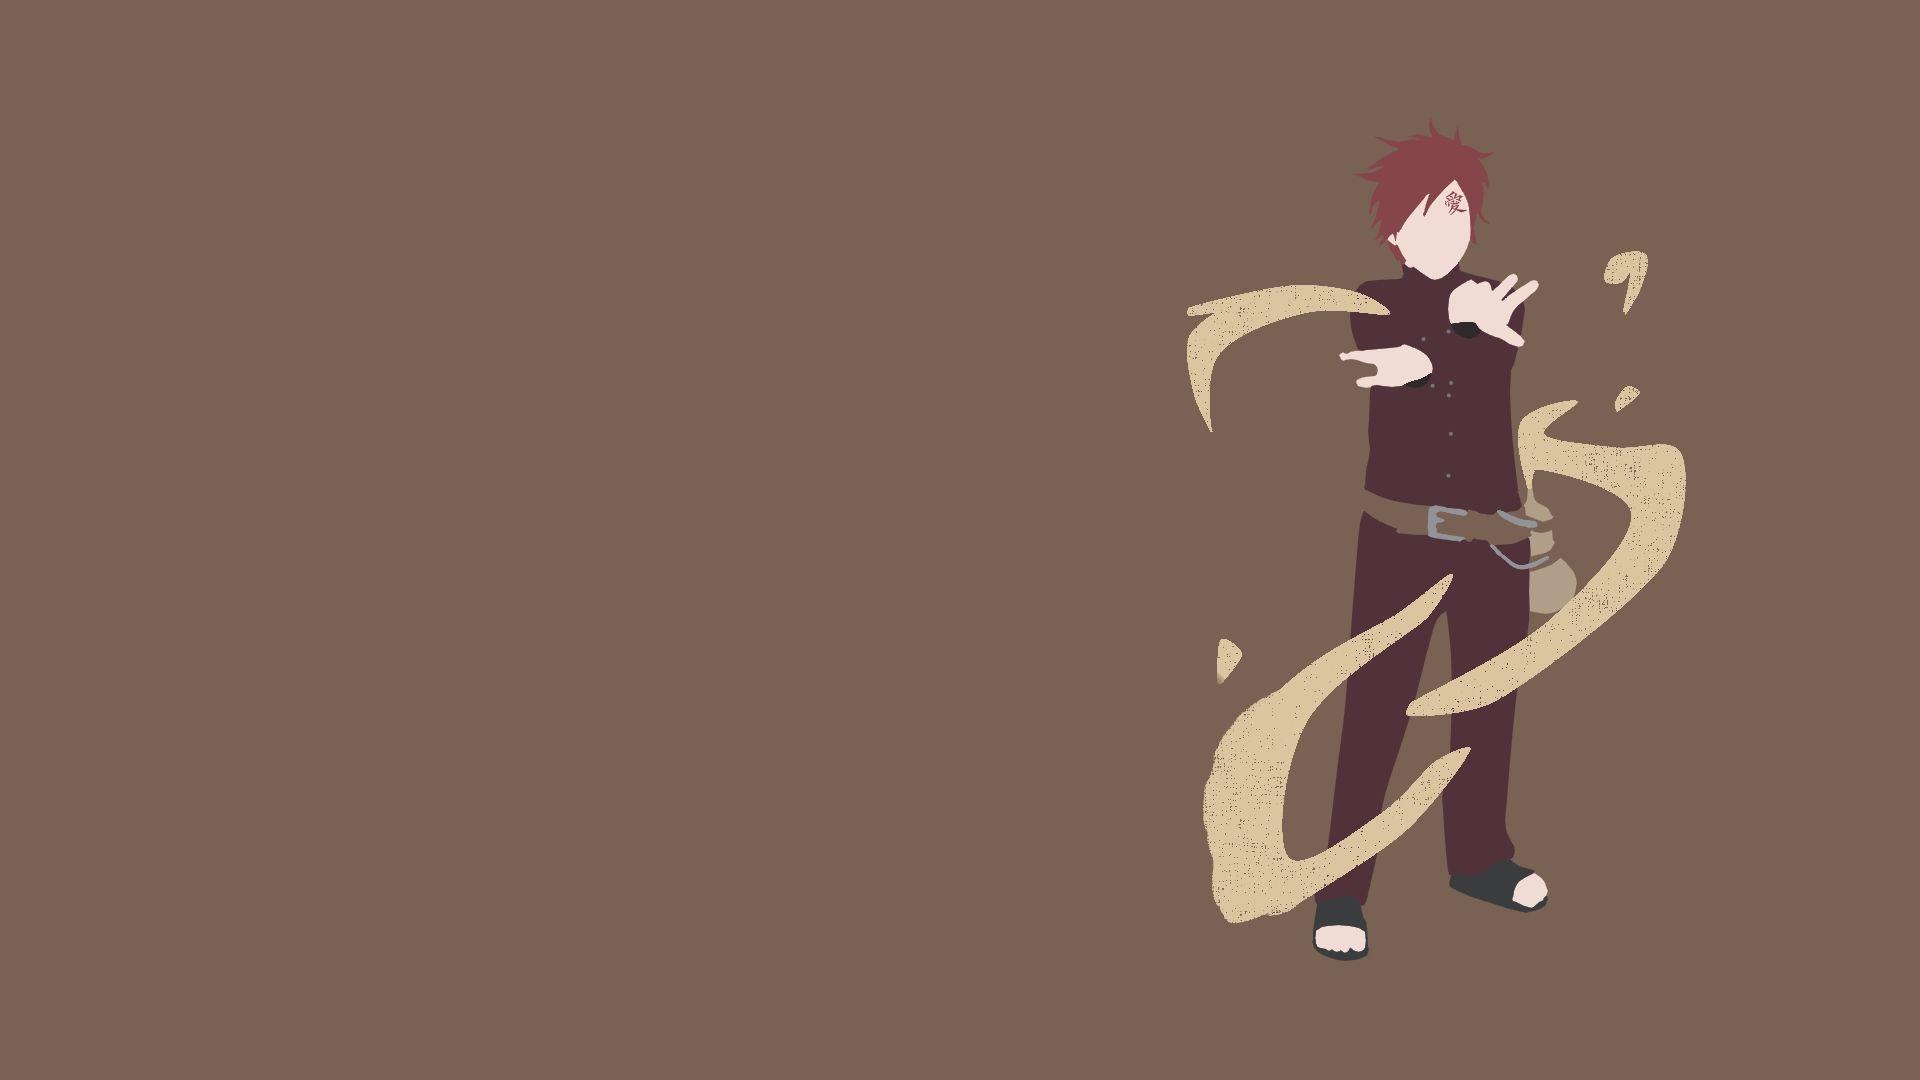 Naruto Minimalist, Background